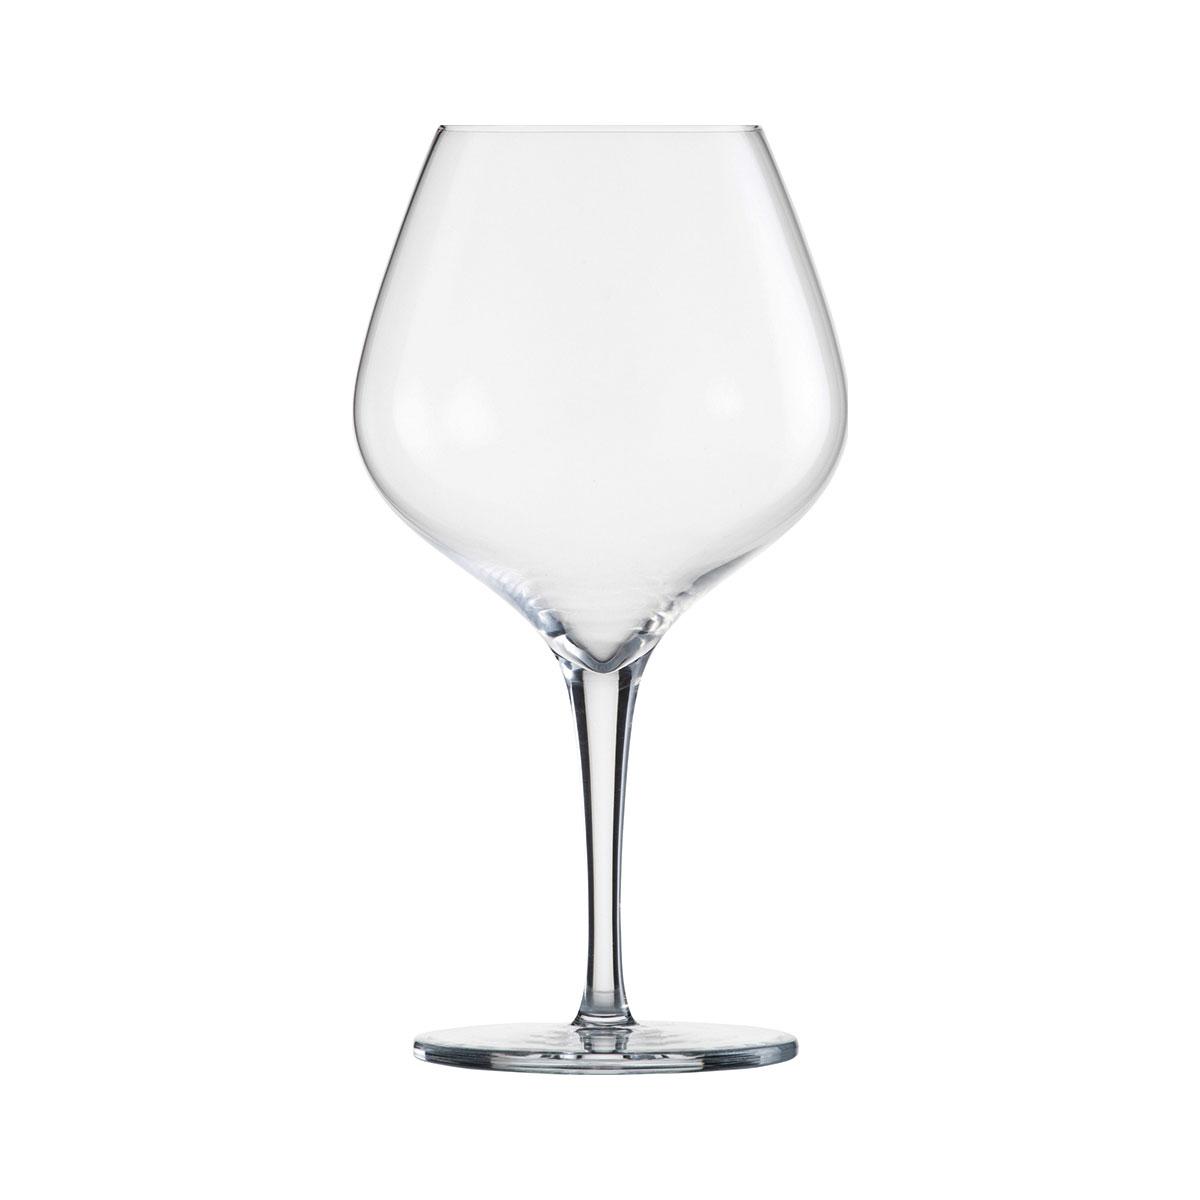 Schott Zwiesel Tritan Fiesta Burgundy, Pinot Noir Glass Single